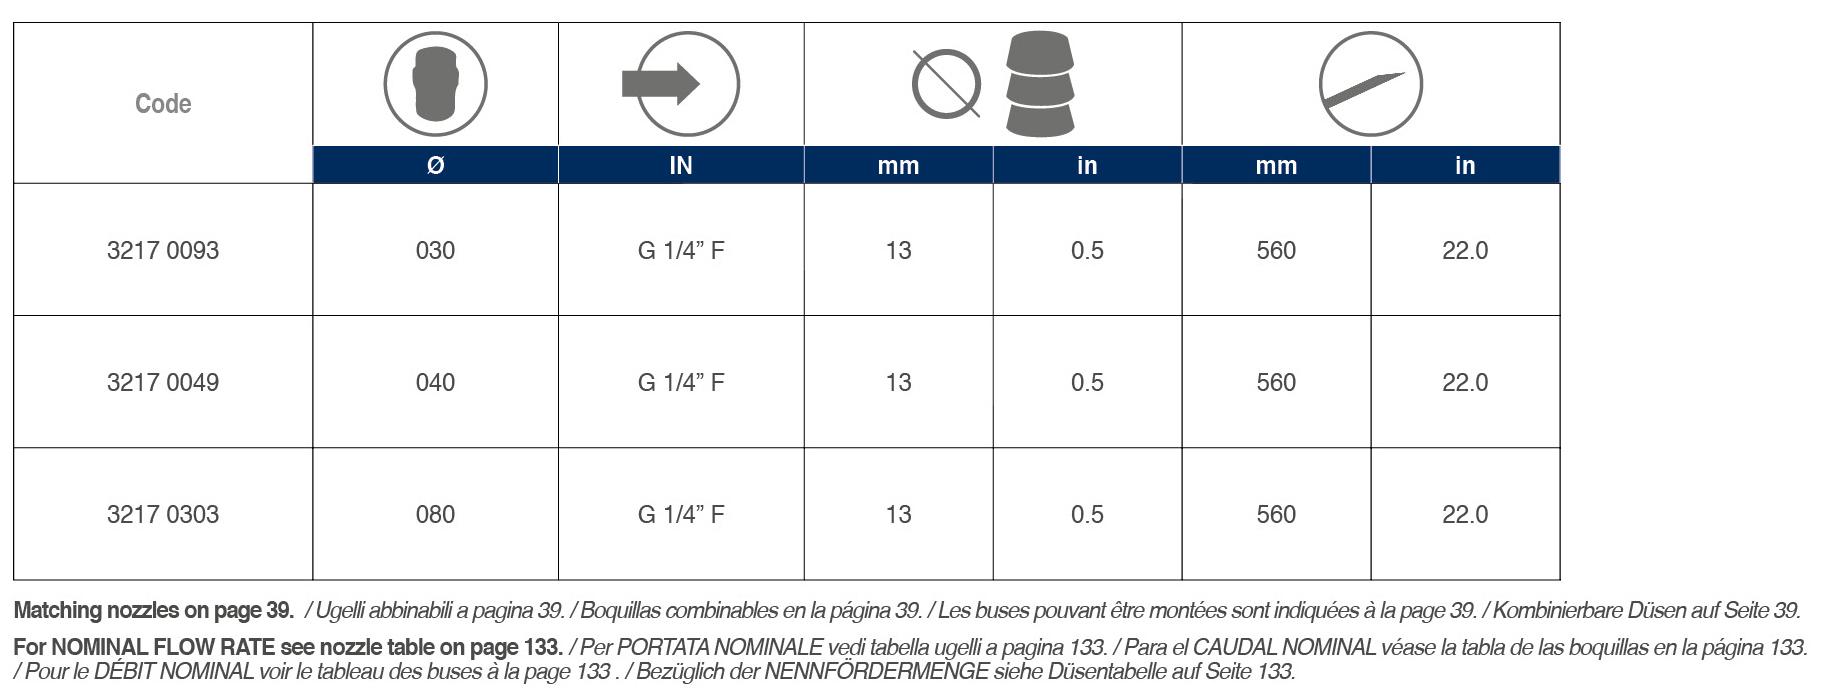 Sand-Soda Blasting Kit TS33 tabelle 02